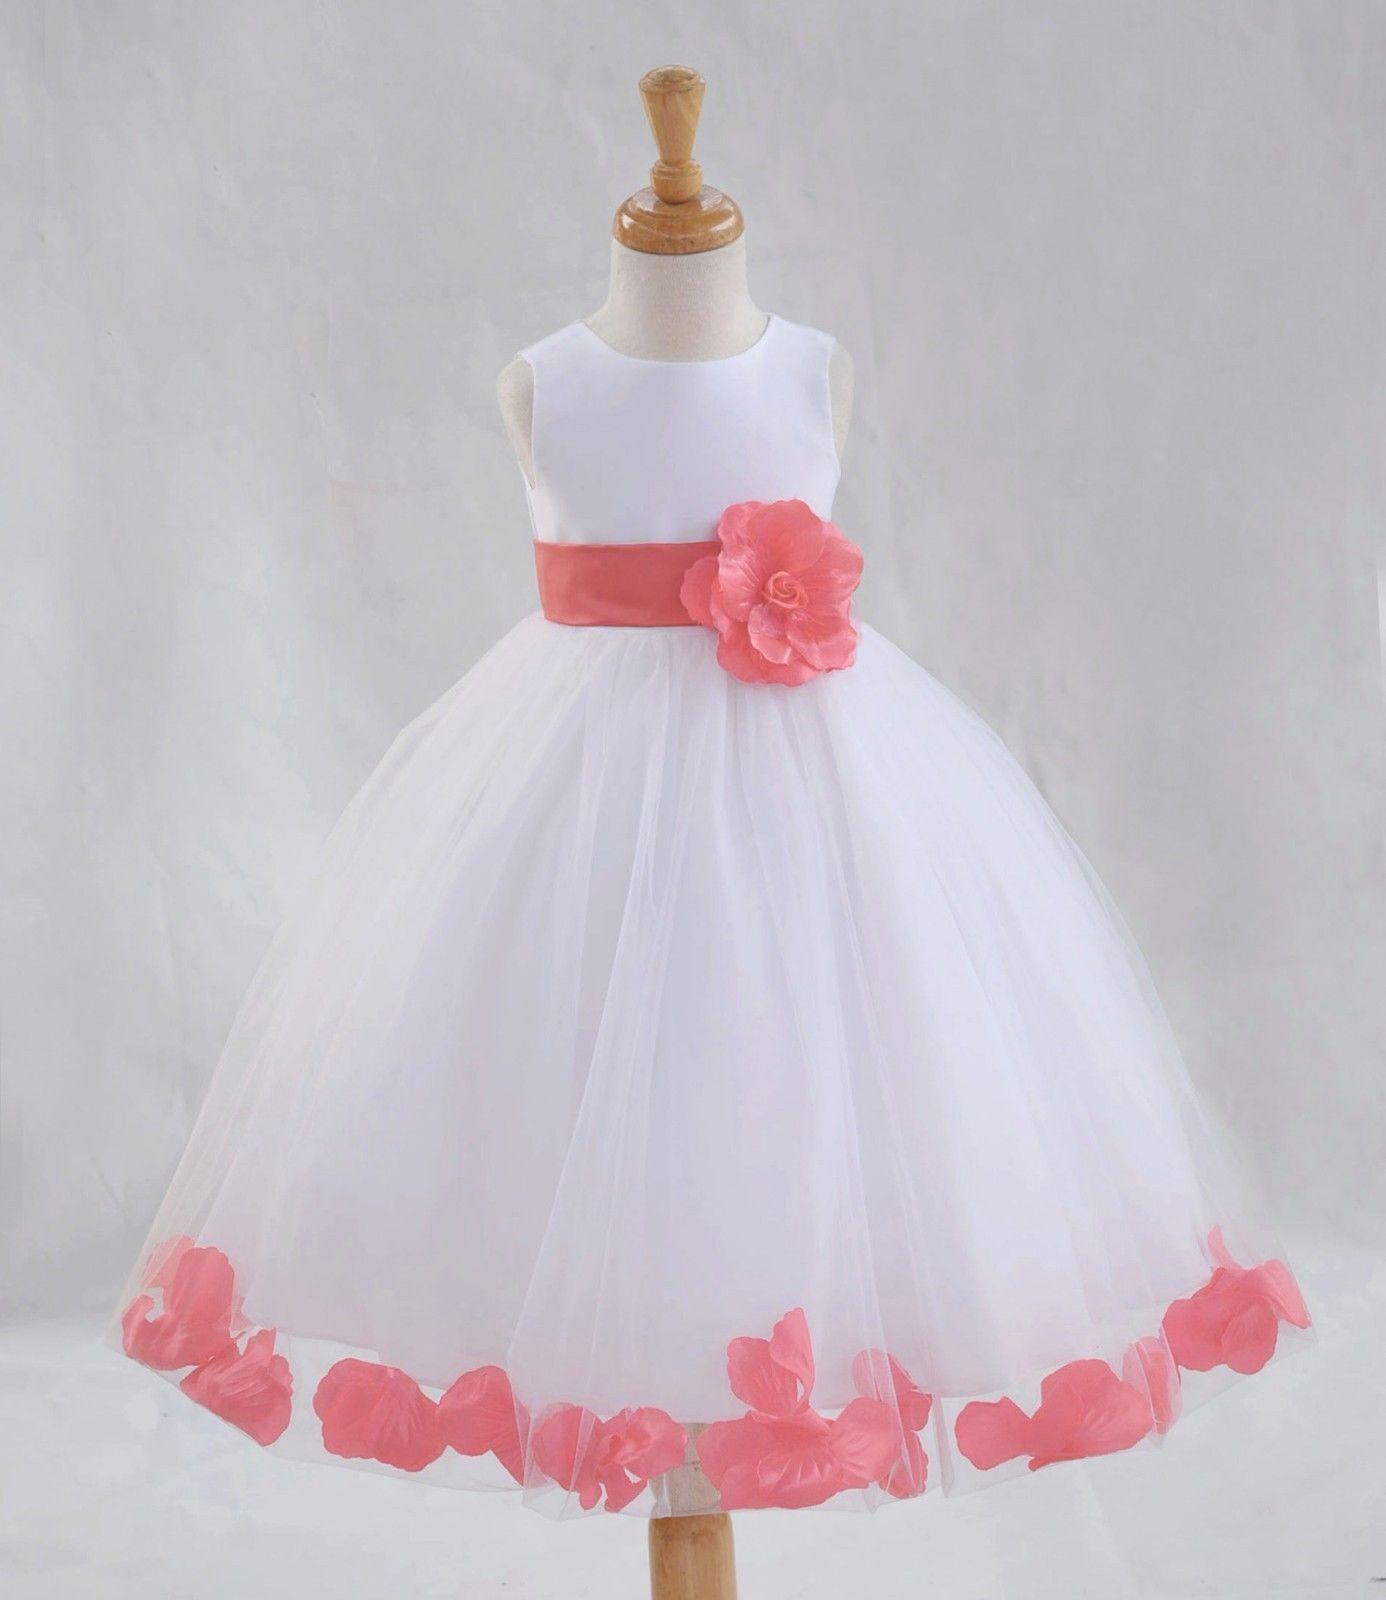 7 ate 9 Apparel Baby Girls Flower Girl Wedding Grey Raglan Onepiece